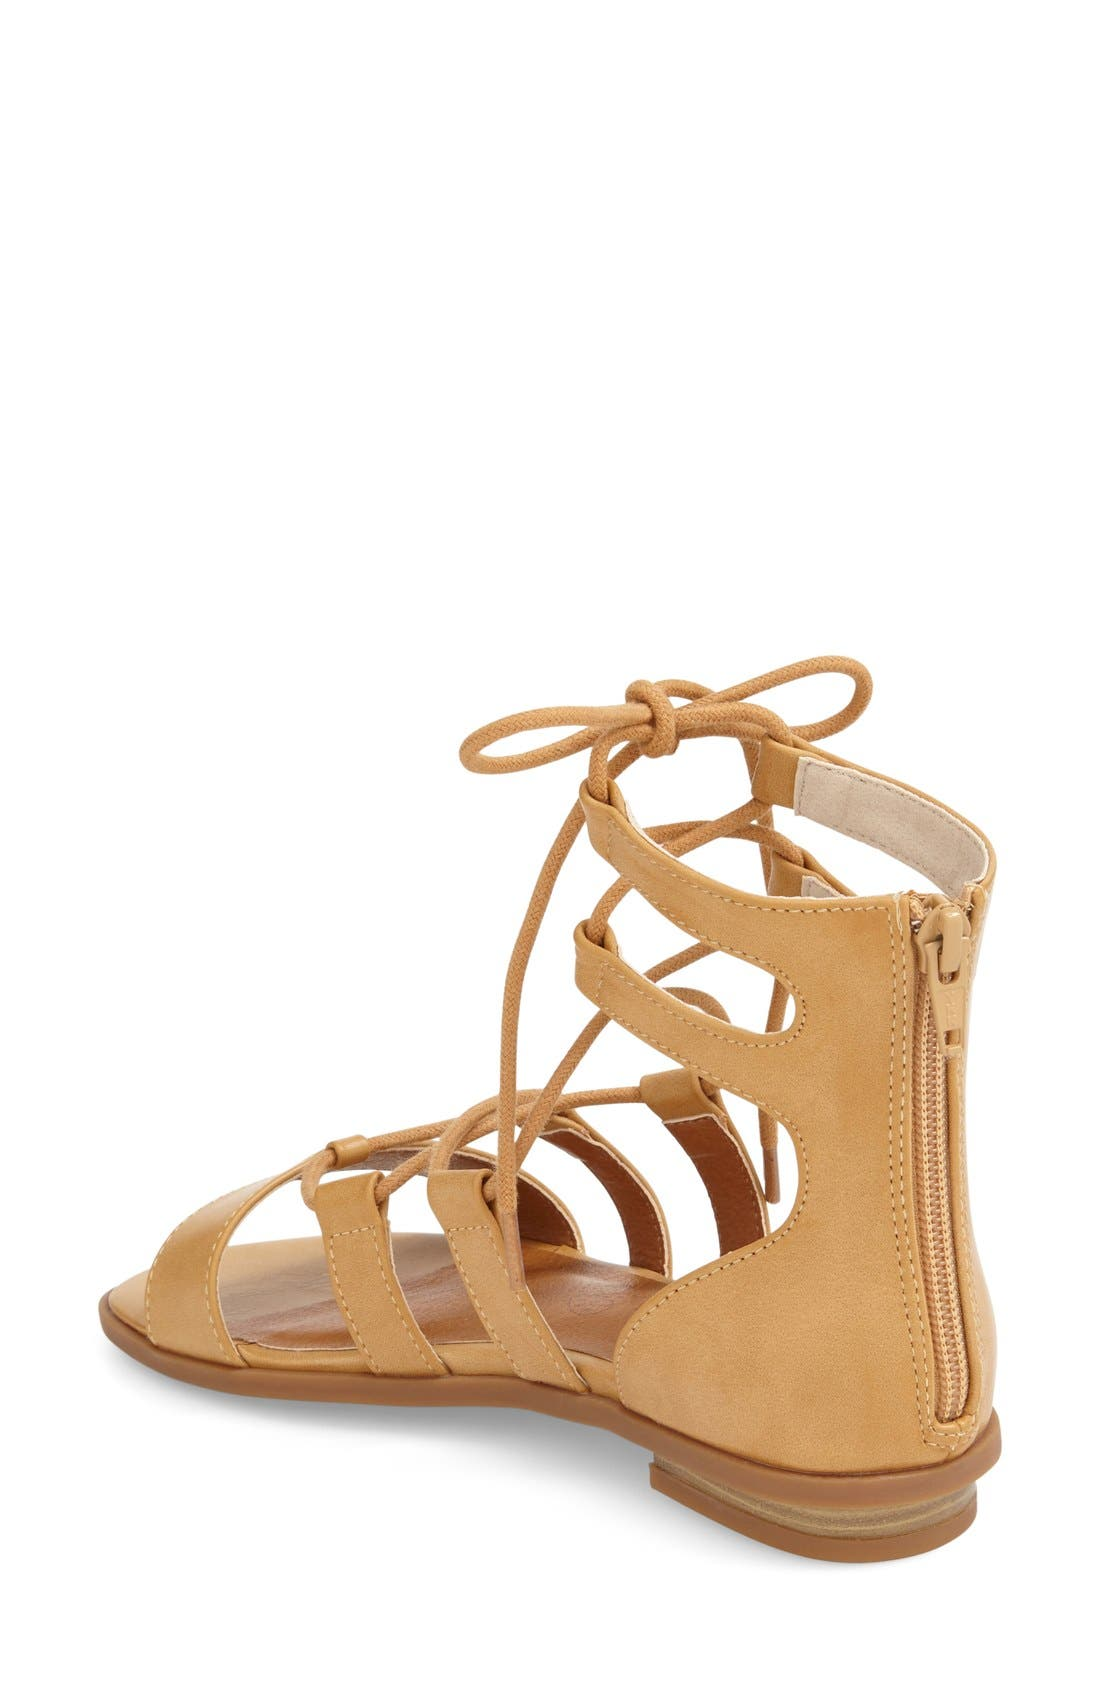 Alternate Image 2  - BC Footwear 'Pocket Size' Lace-Up Flat Sandal (Women)